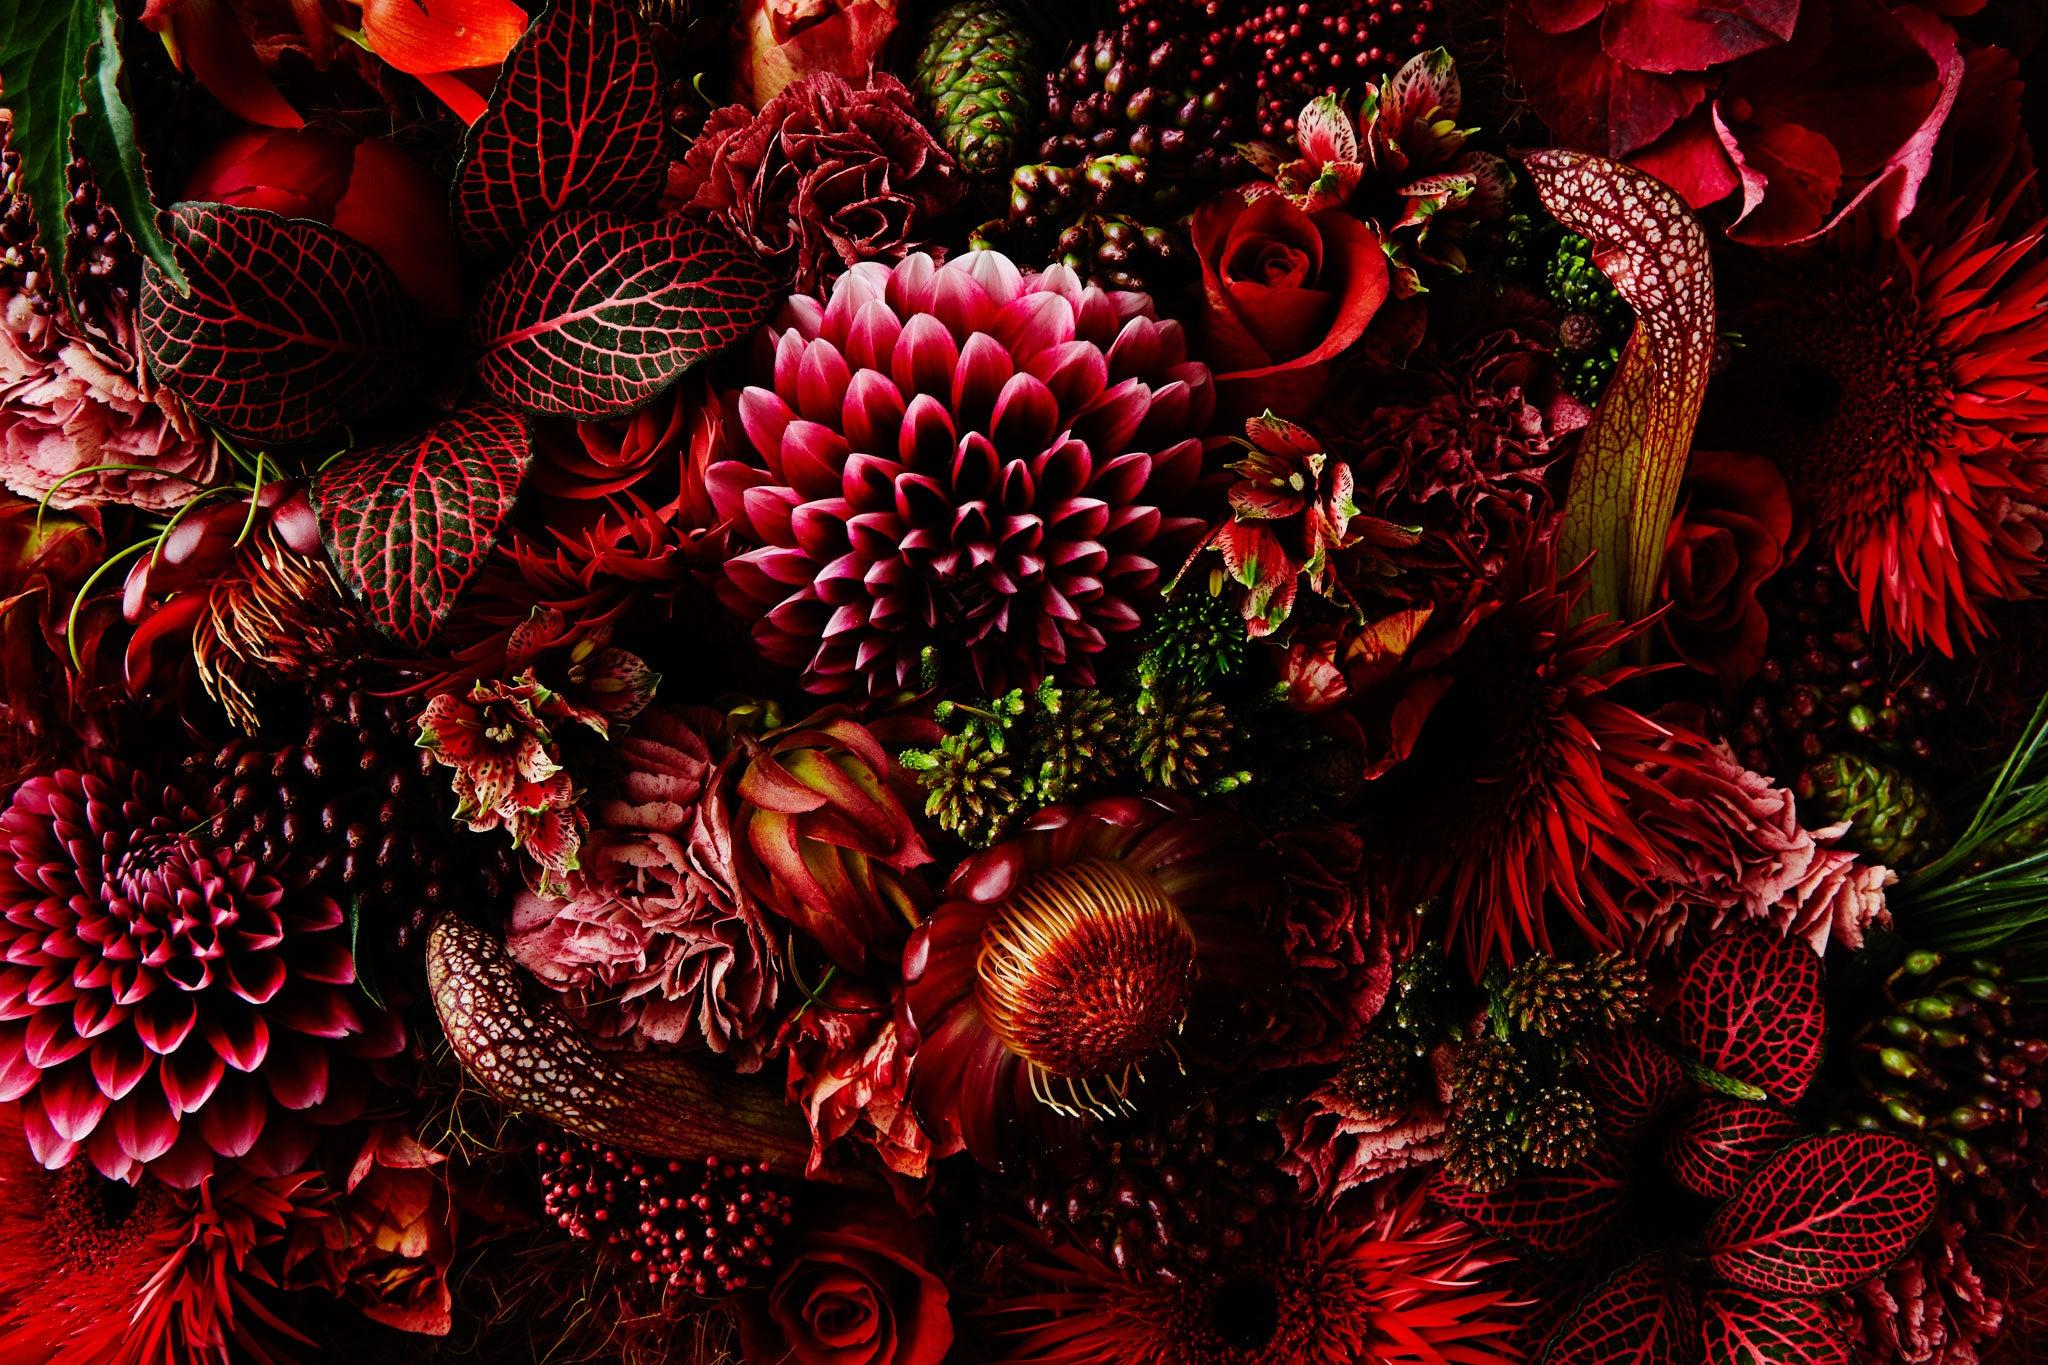 Encyclopaedia Of Flower Ii Makoto Azuma Delights The Art